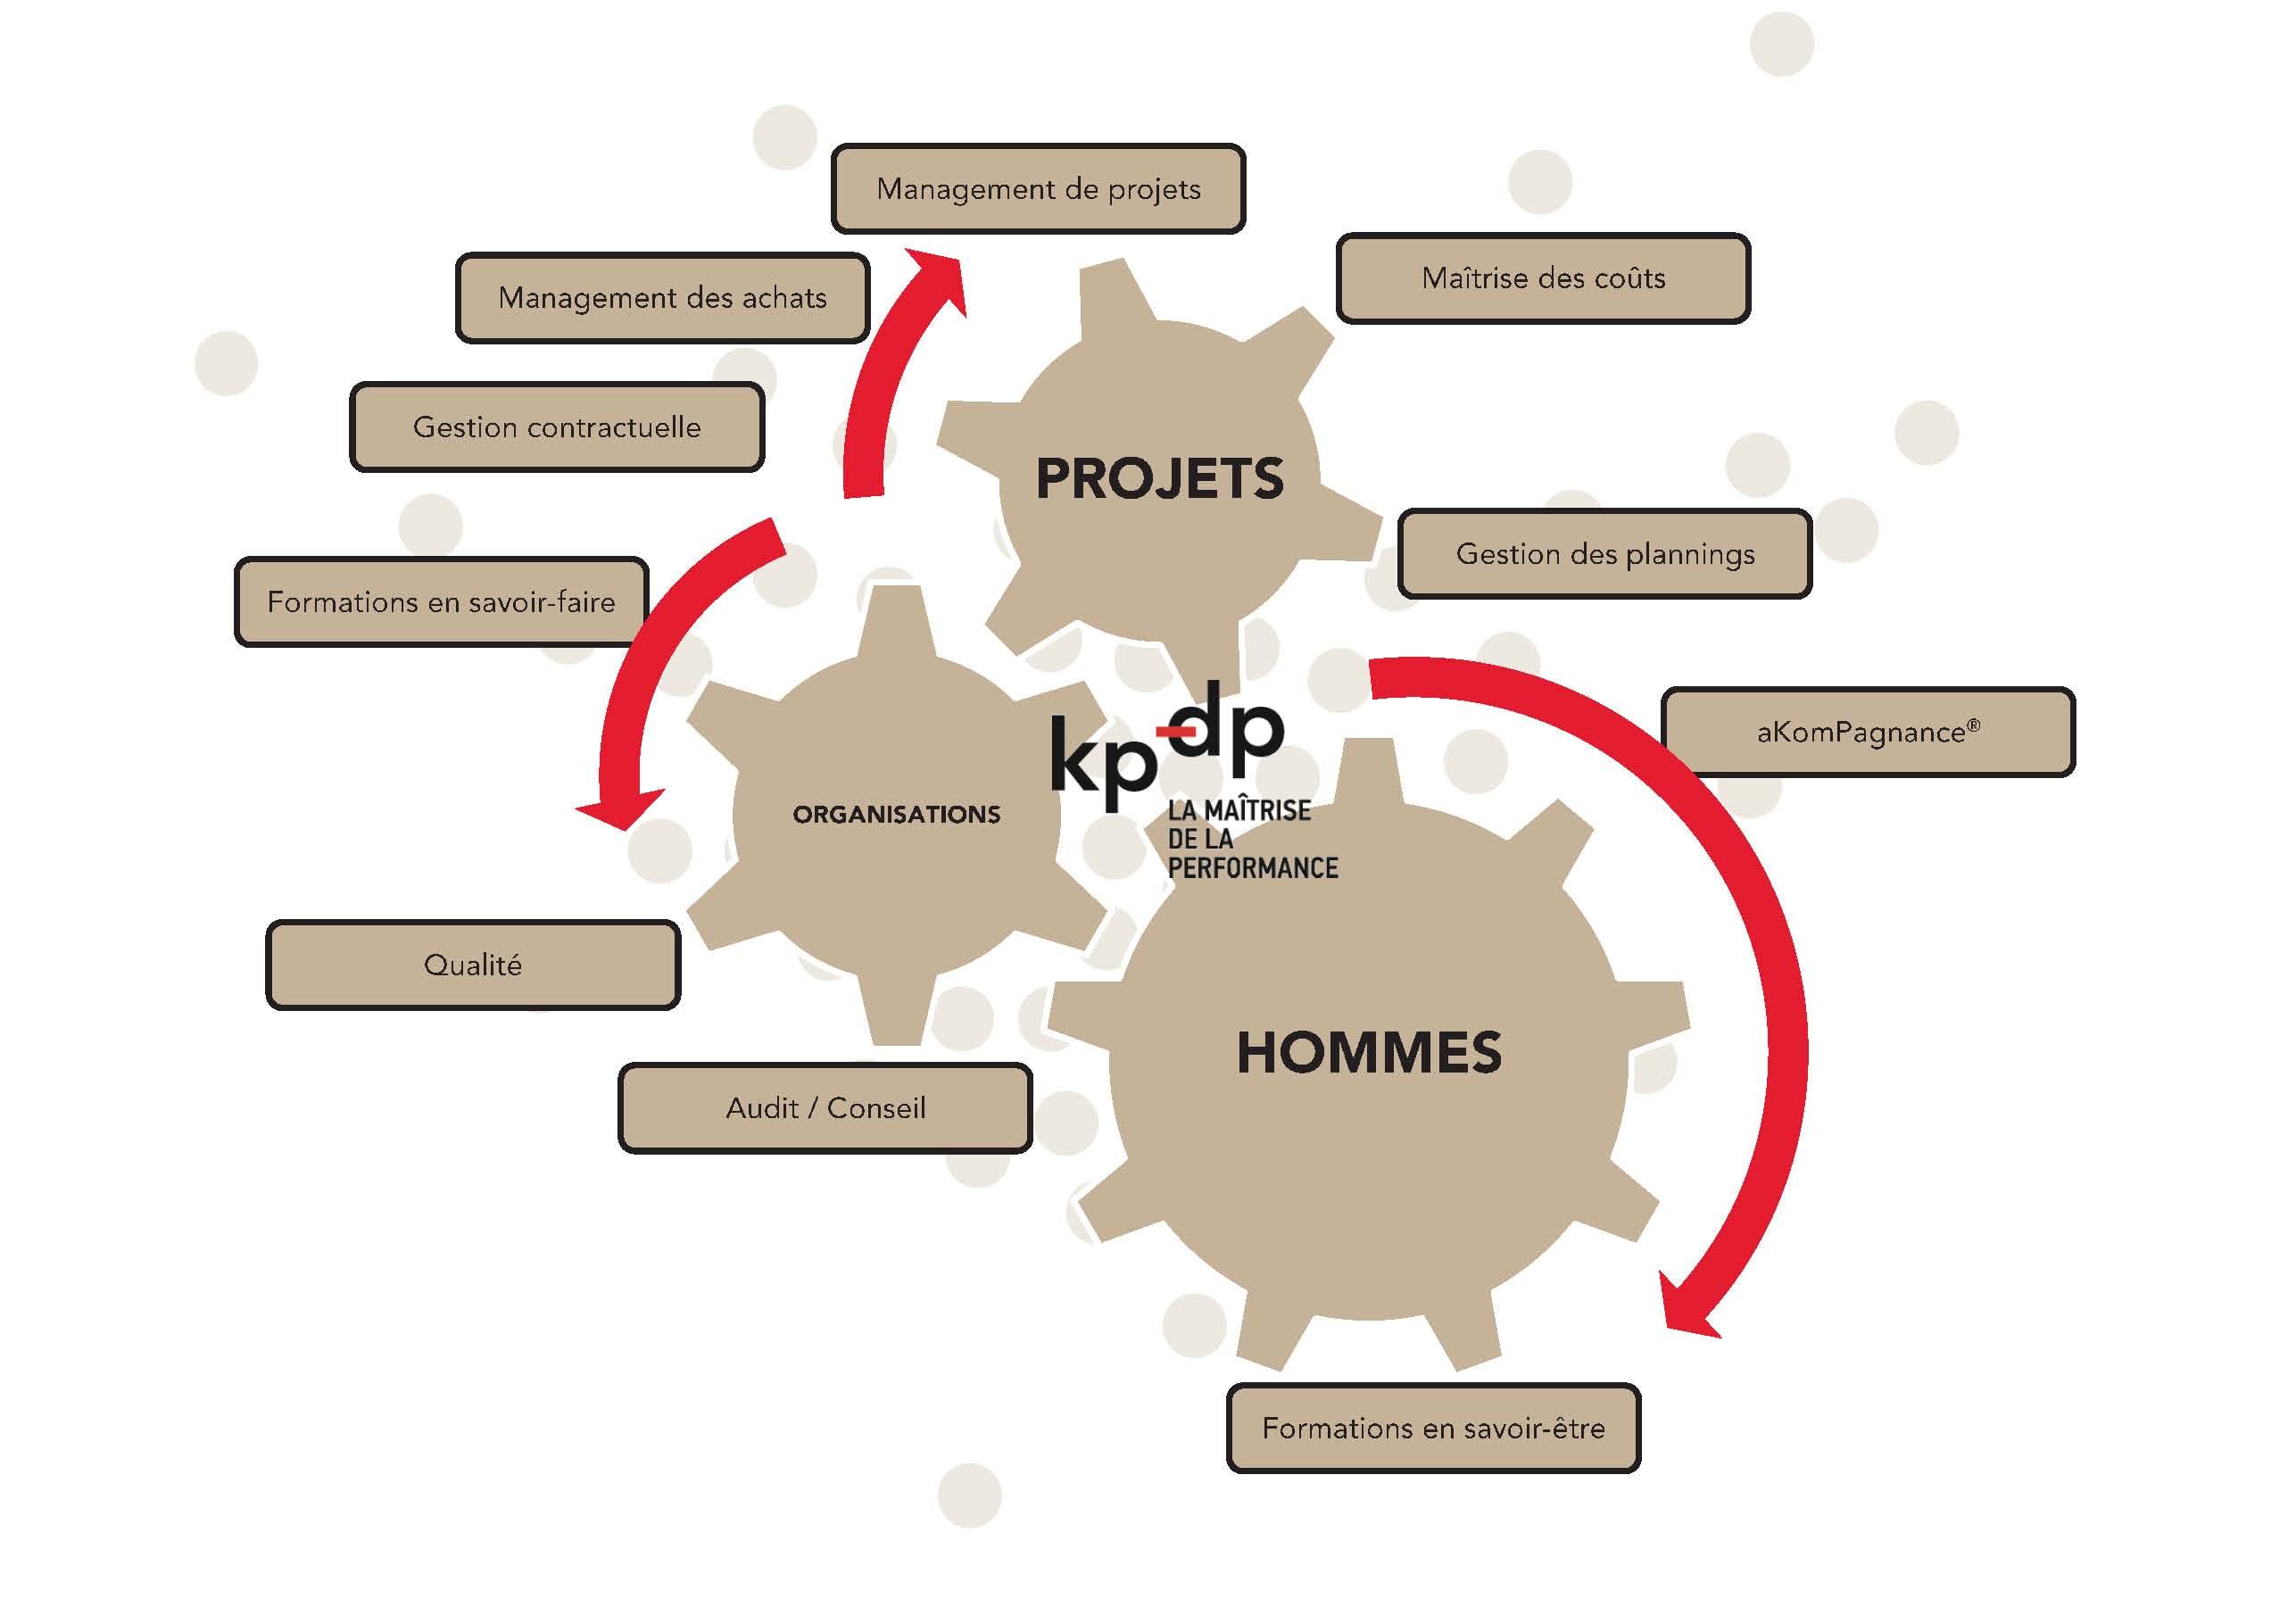 Les métiers de KP-DP